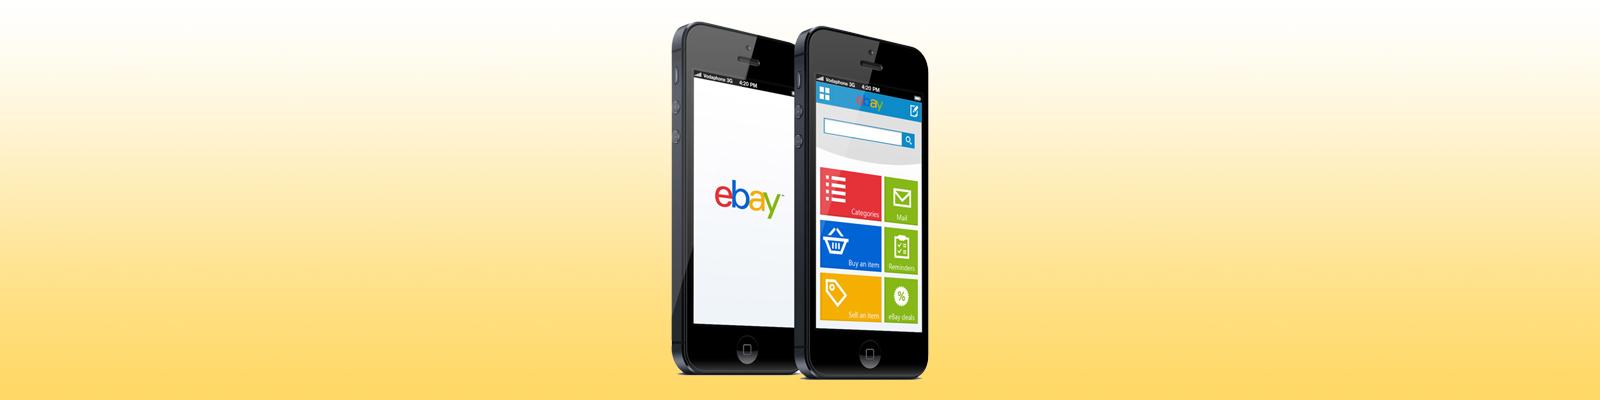 ebay features